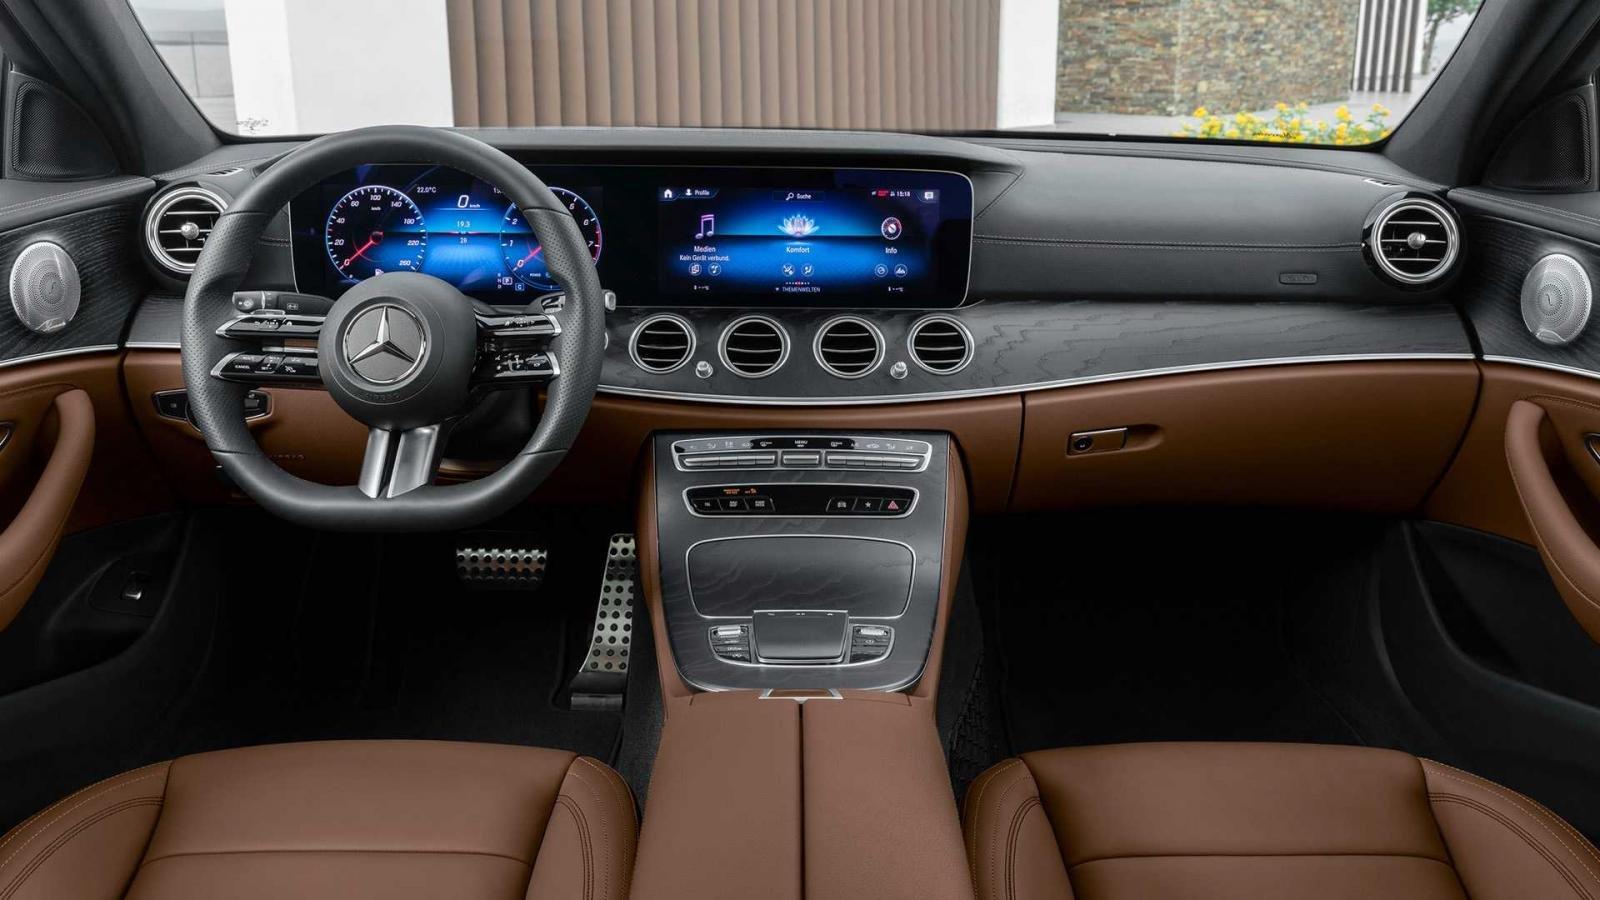 Mercedes-Benz E-Class 2021 hứa hẹn cung cấp cảm giác lái tuyệt vời hơn.